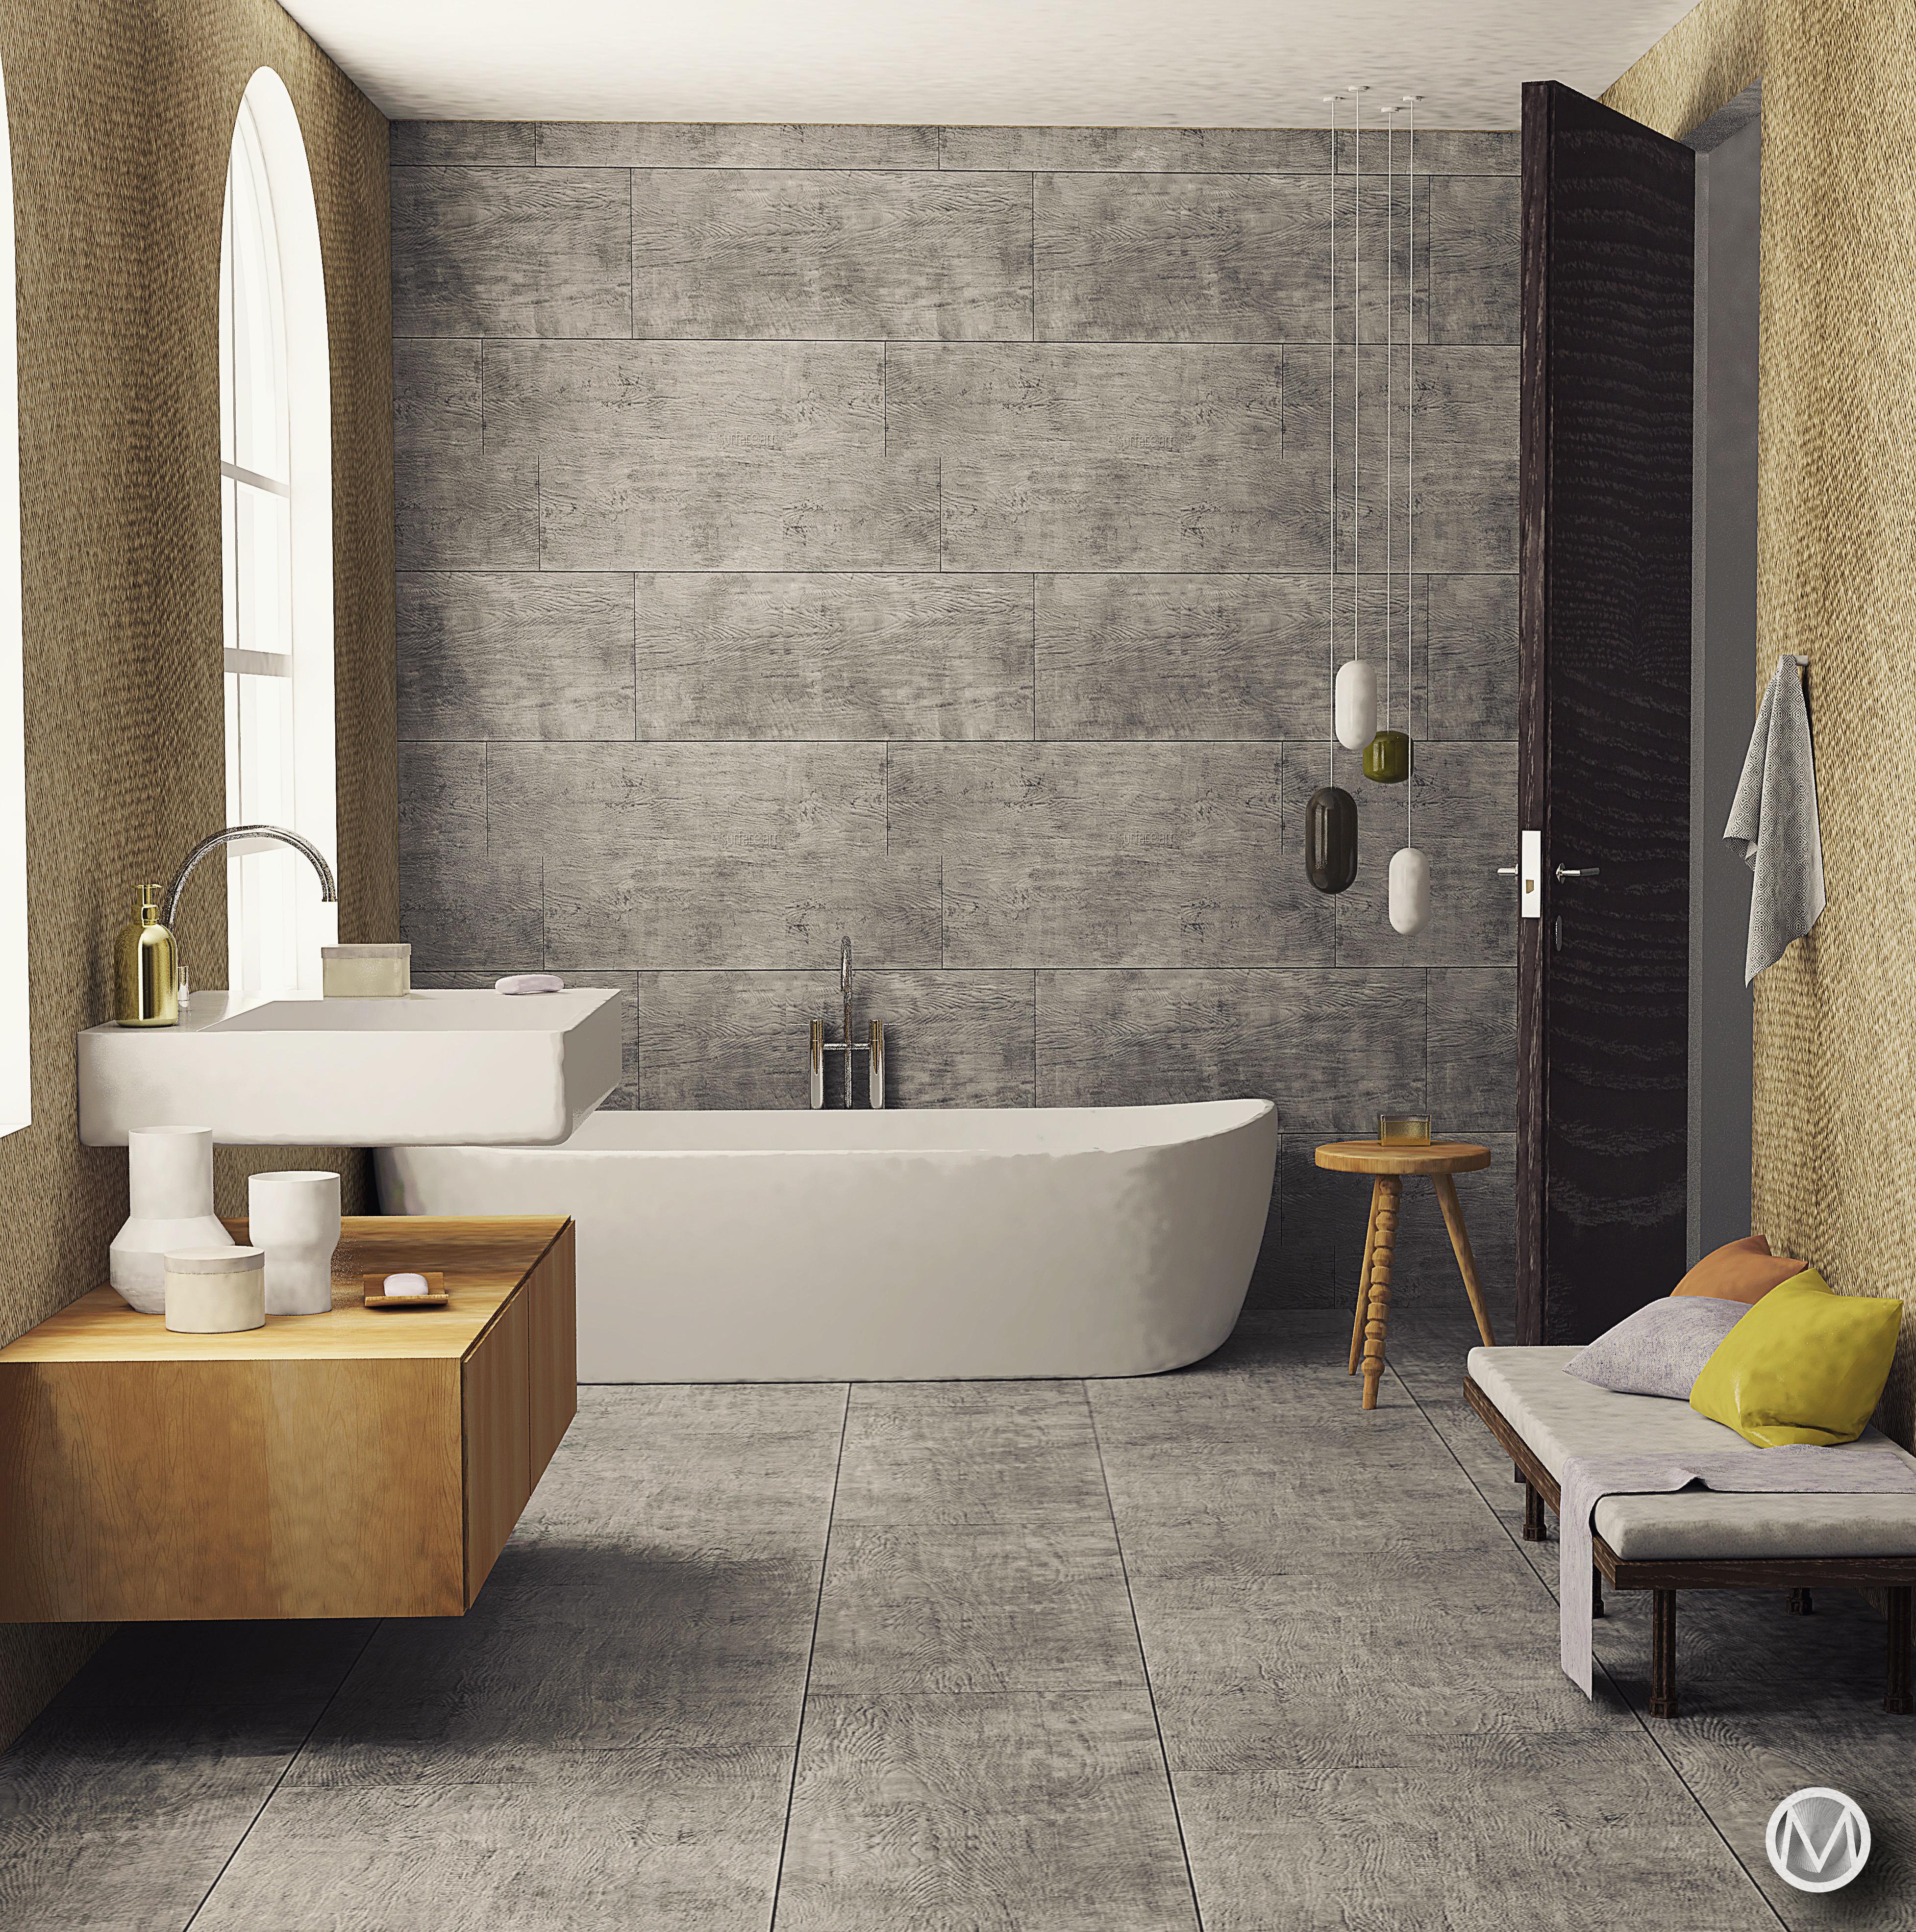 Free stock photo of 3d model 3ds max arcviz for Design bathroom online free 3d